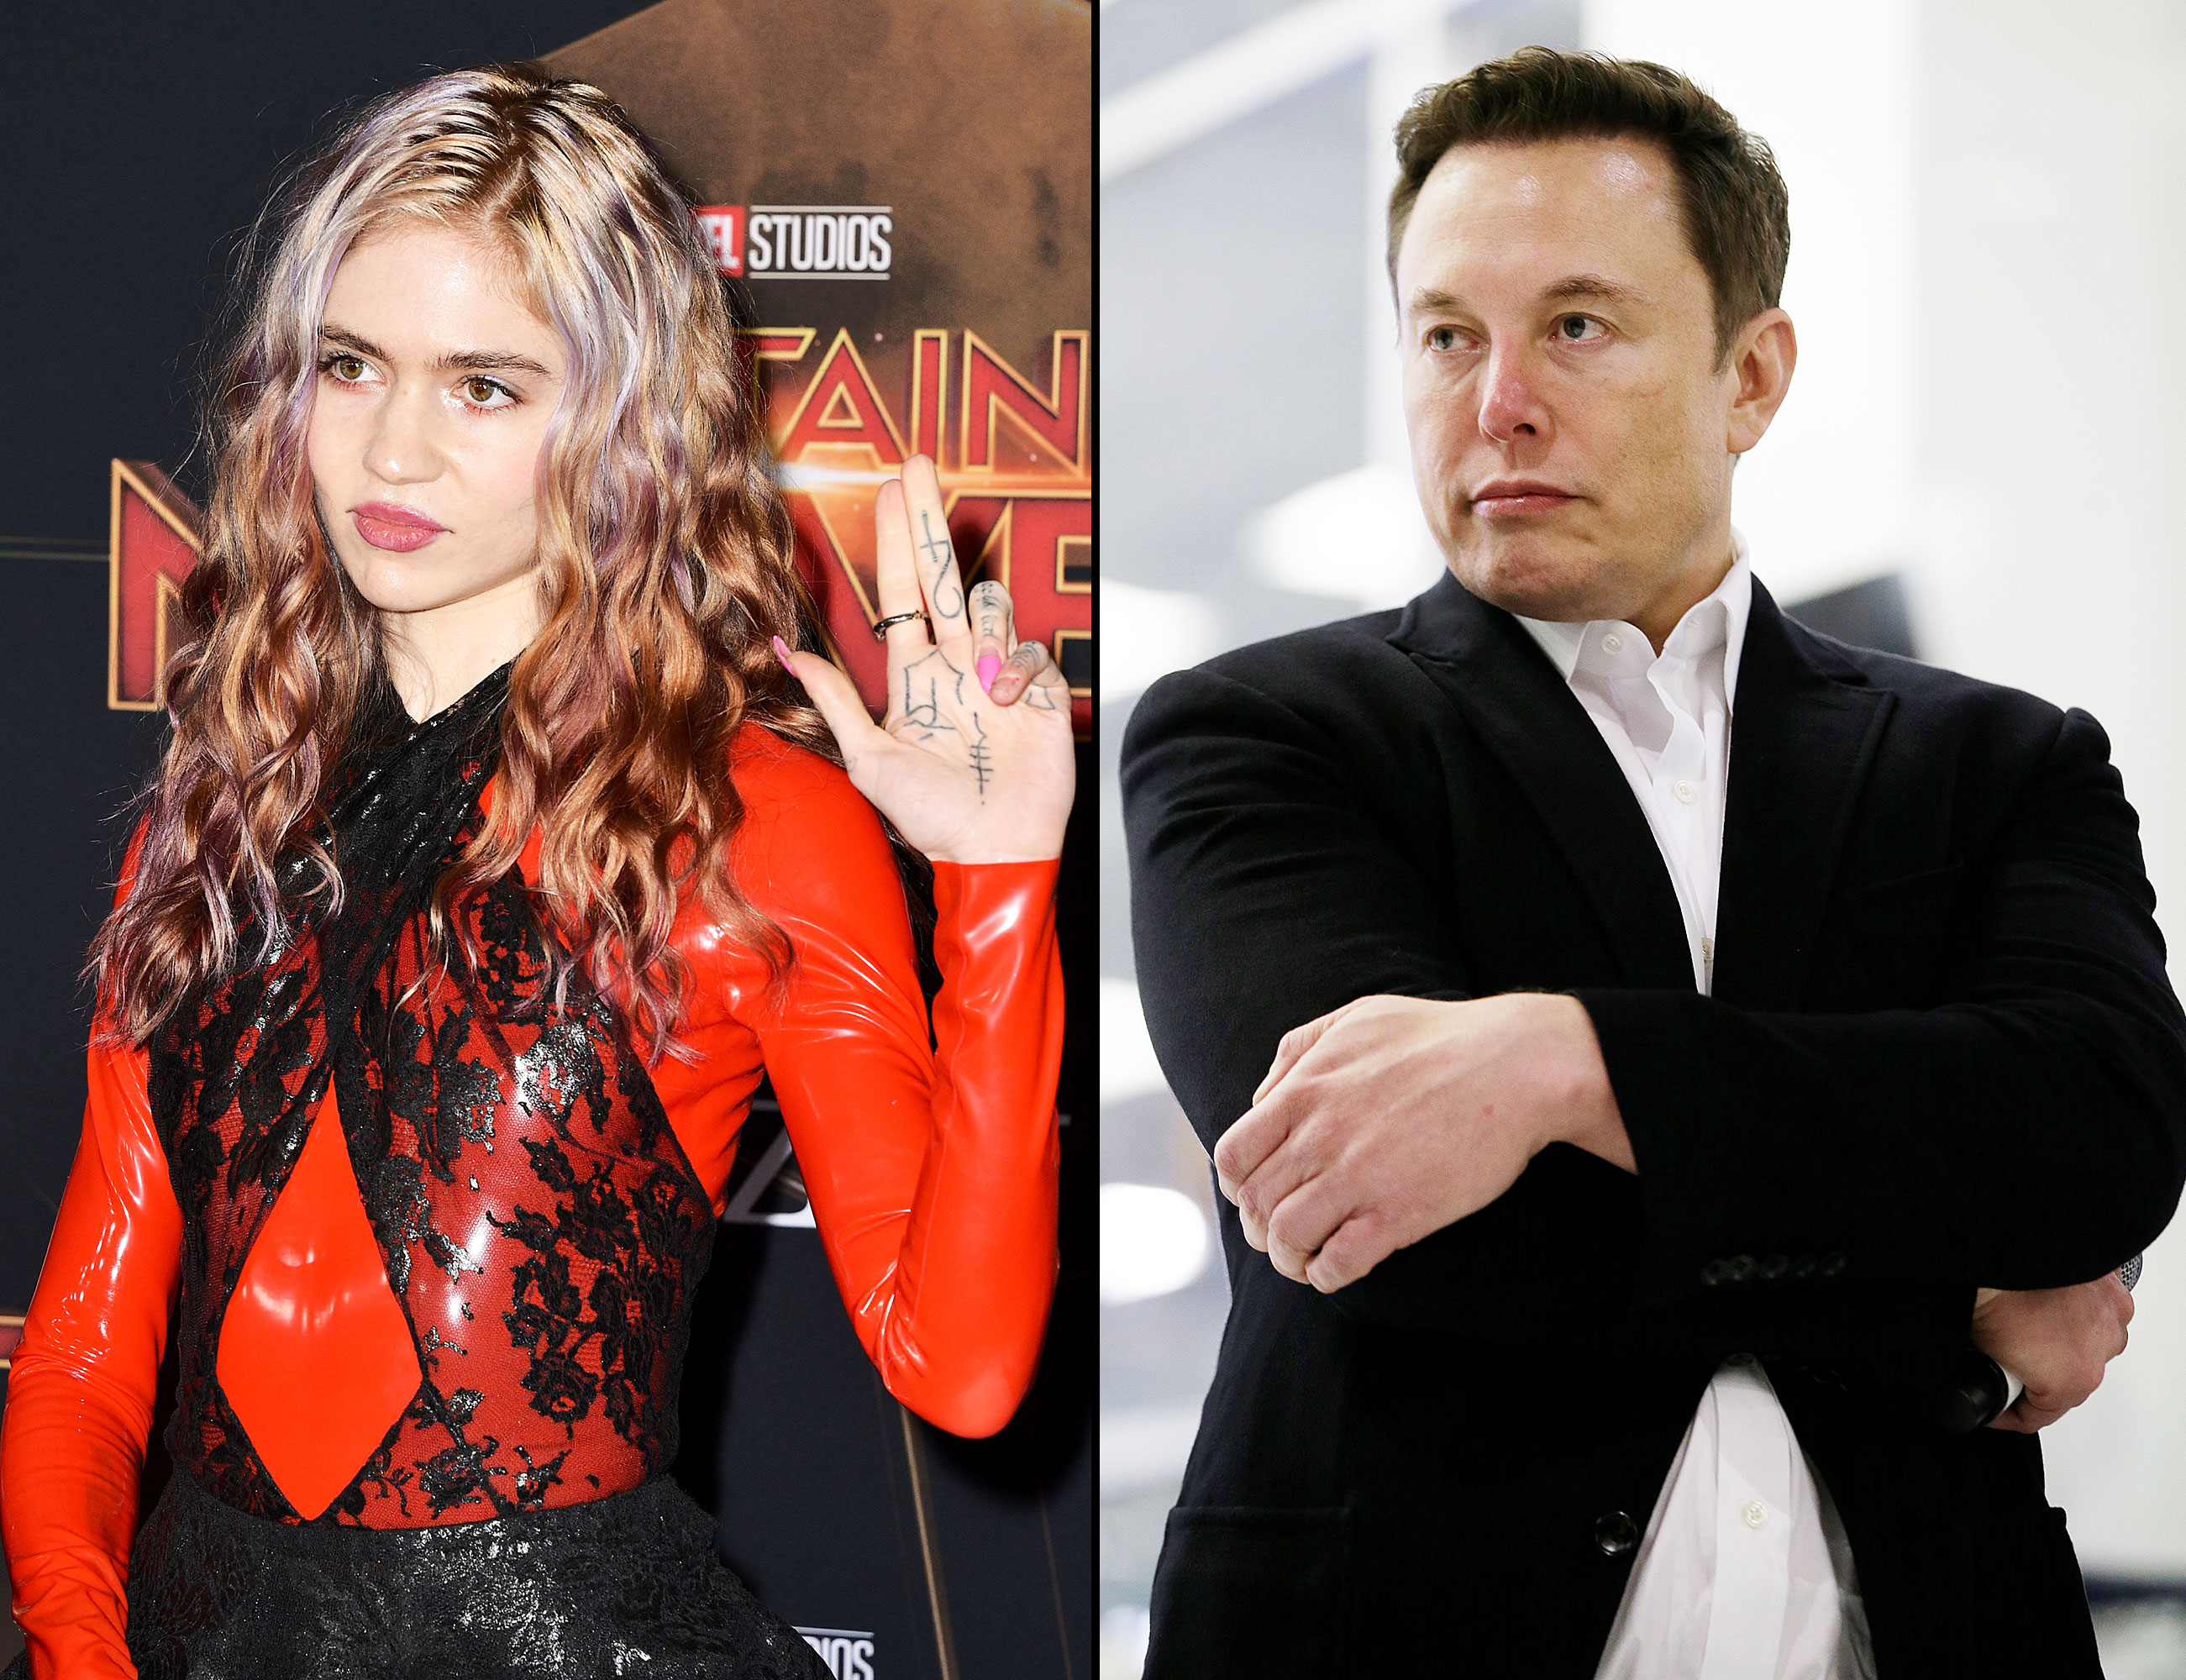 Elon Musk and Grimes' Relationship Timeline